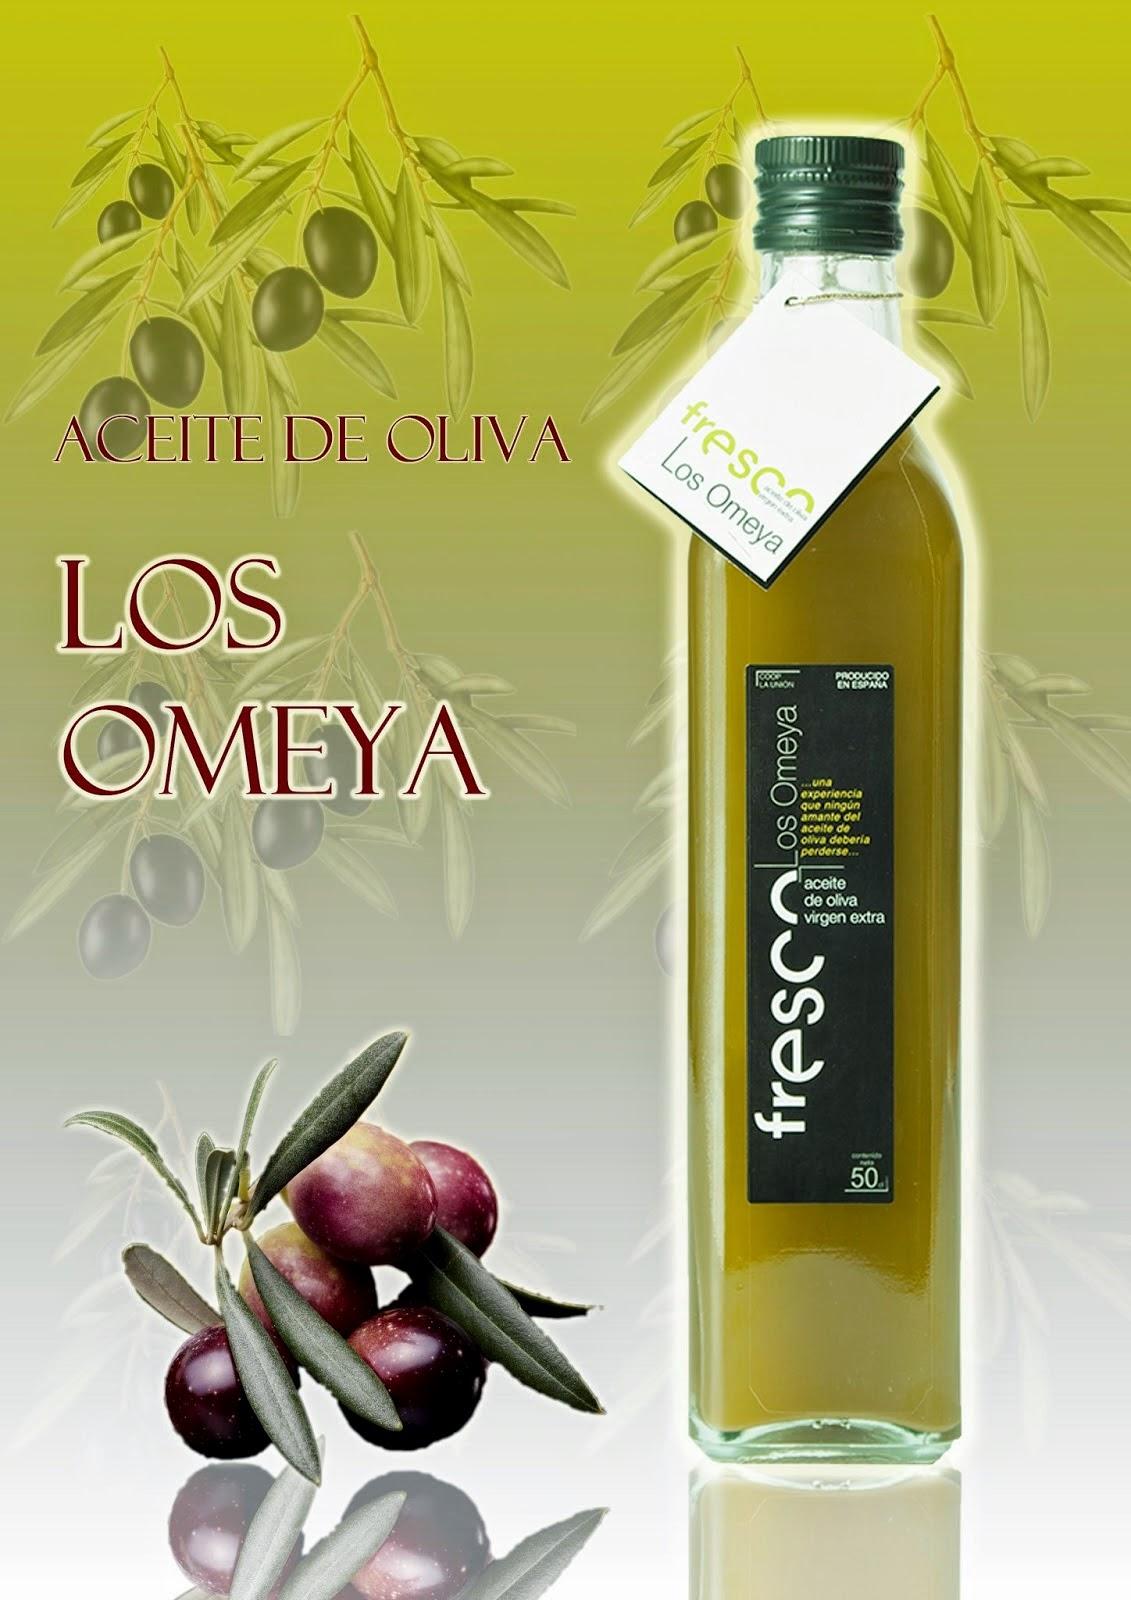 Aceite de Oliva Los Omeya